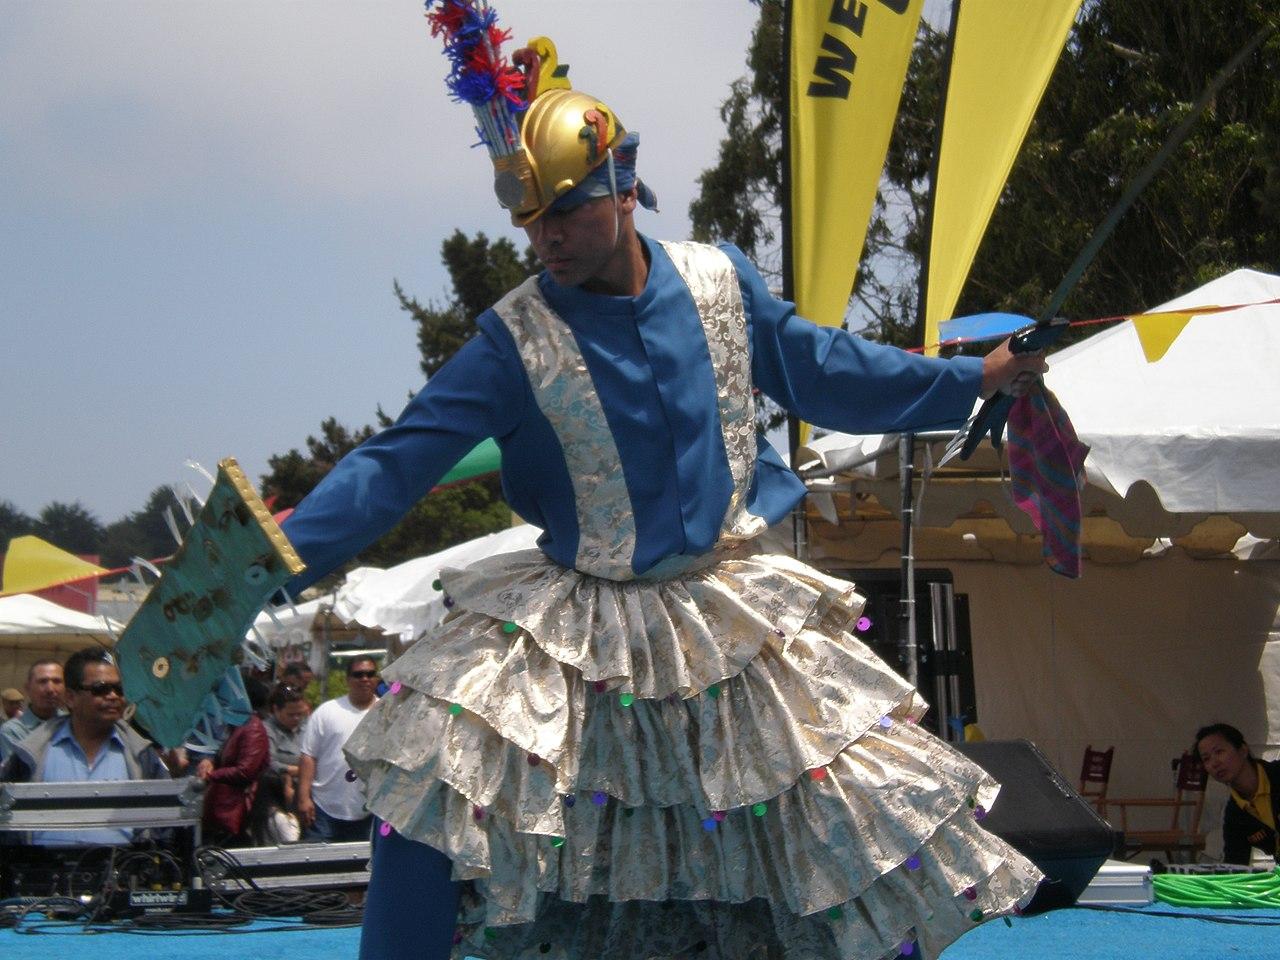 Parangal dance company philippine folk dance - File Parangal Dance Co Performing Sagayan At 14th Af Afc 07 Jpg